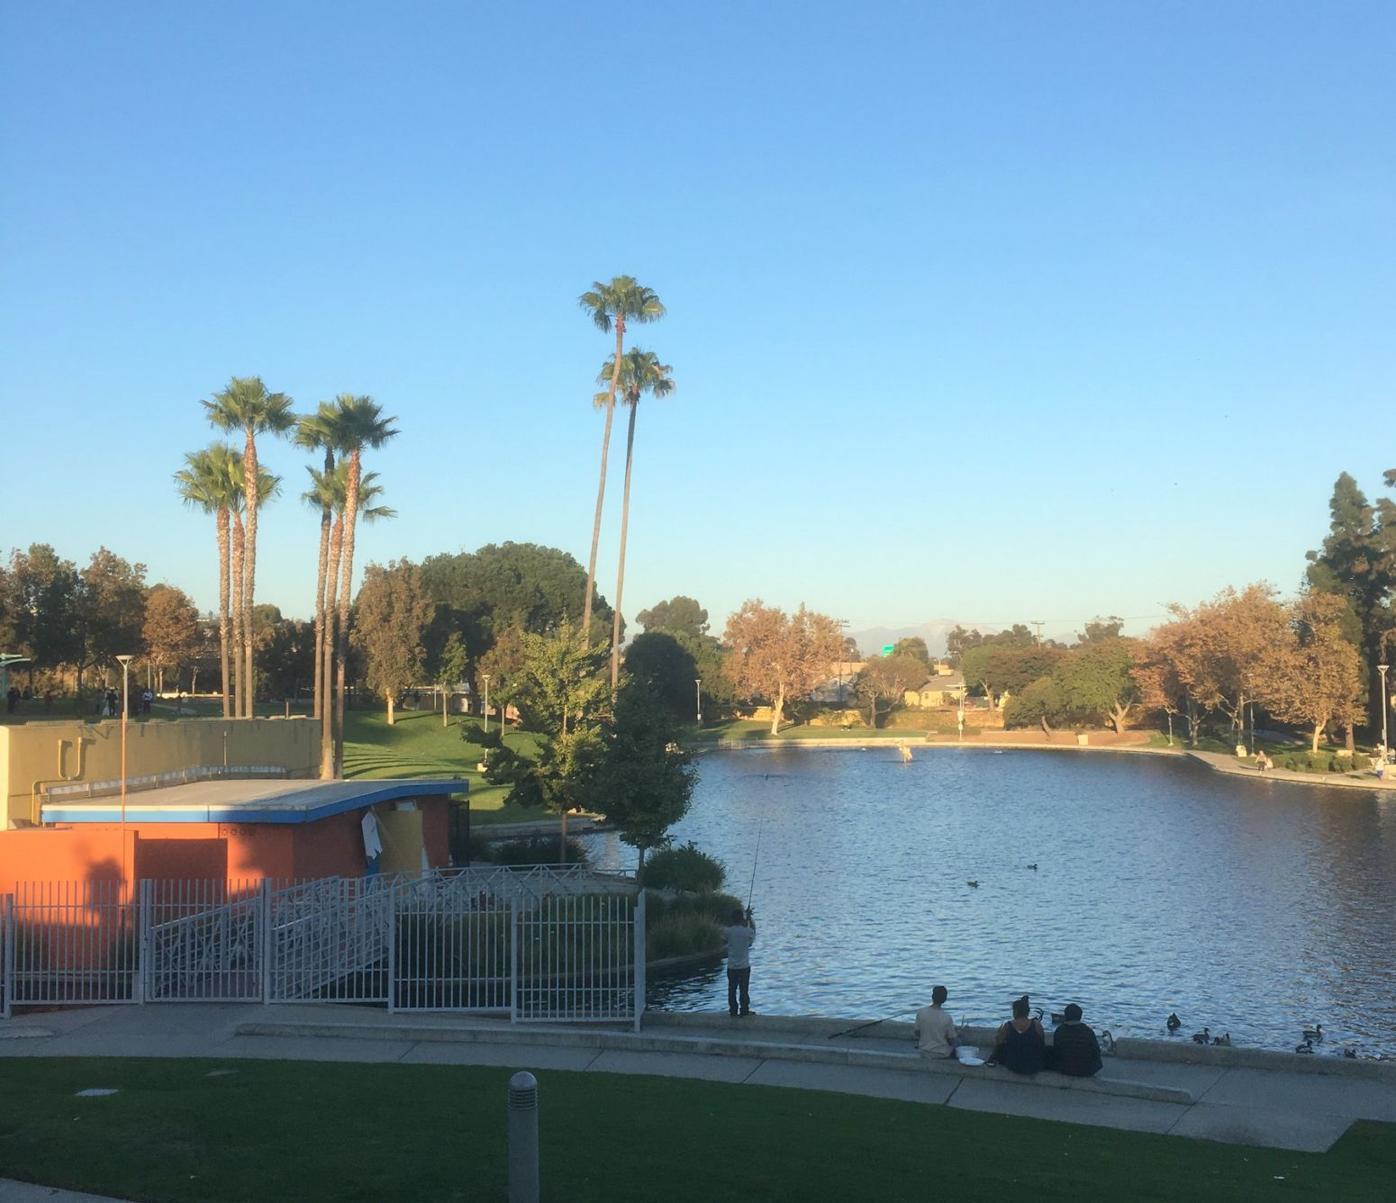 Belvedere Park Lake at the East LA Civic Center